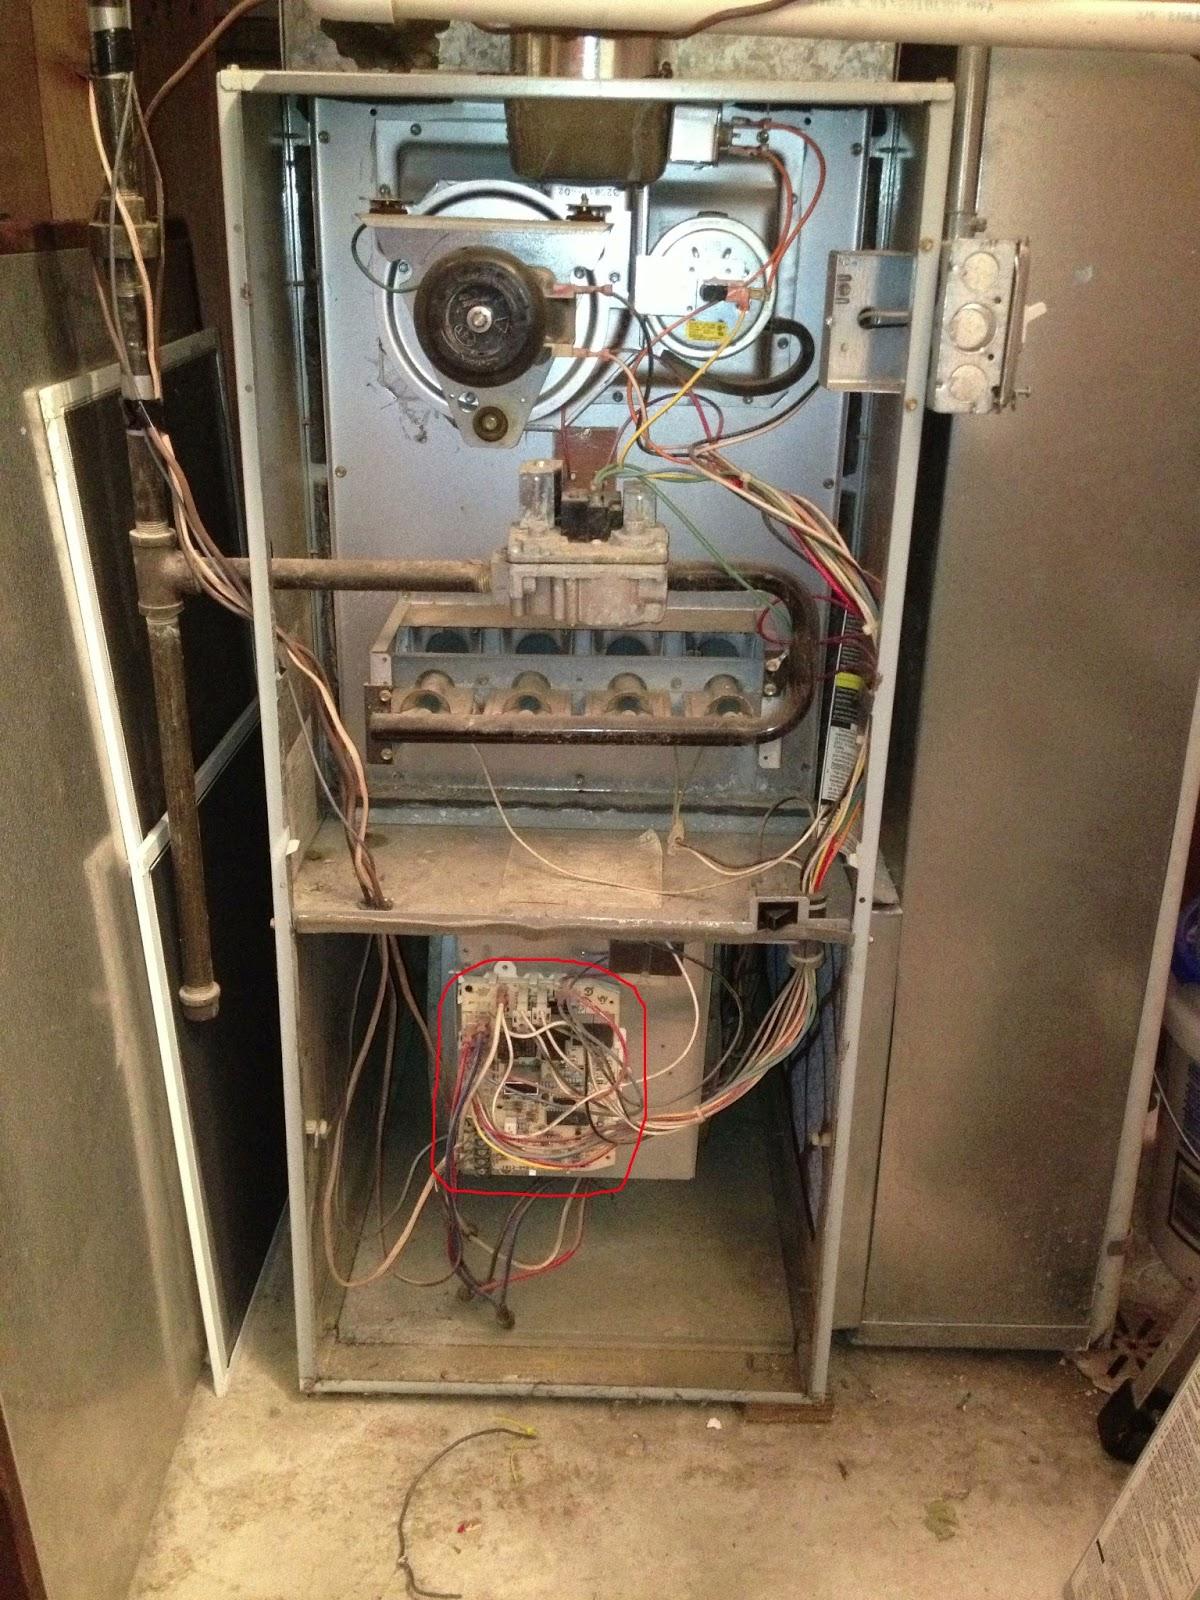 bryant furnace thermostat wiring wiring library carrier electric furnace thermostat wiring bryant furnace thermostat wiring [ 1200 x 1600 Pixel ]